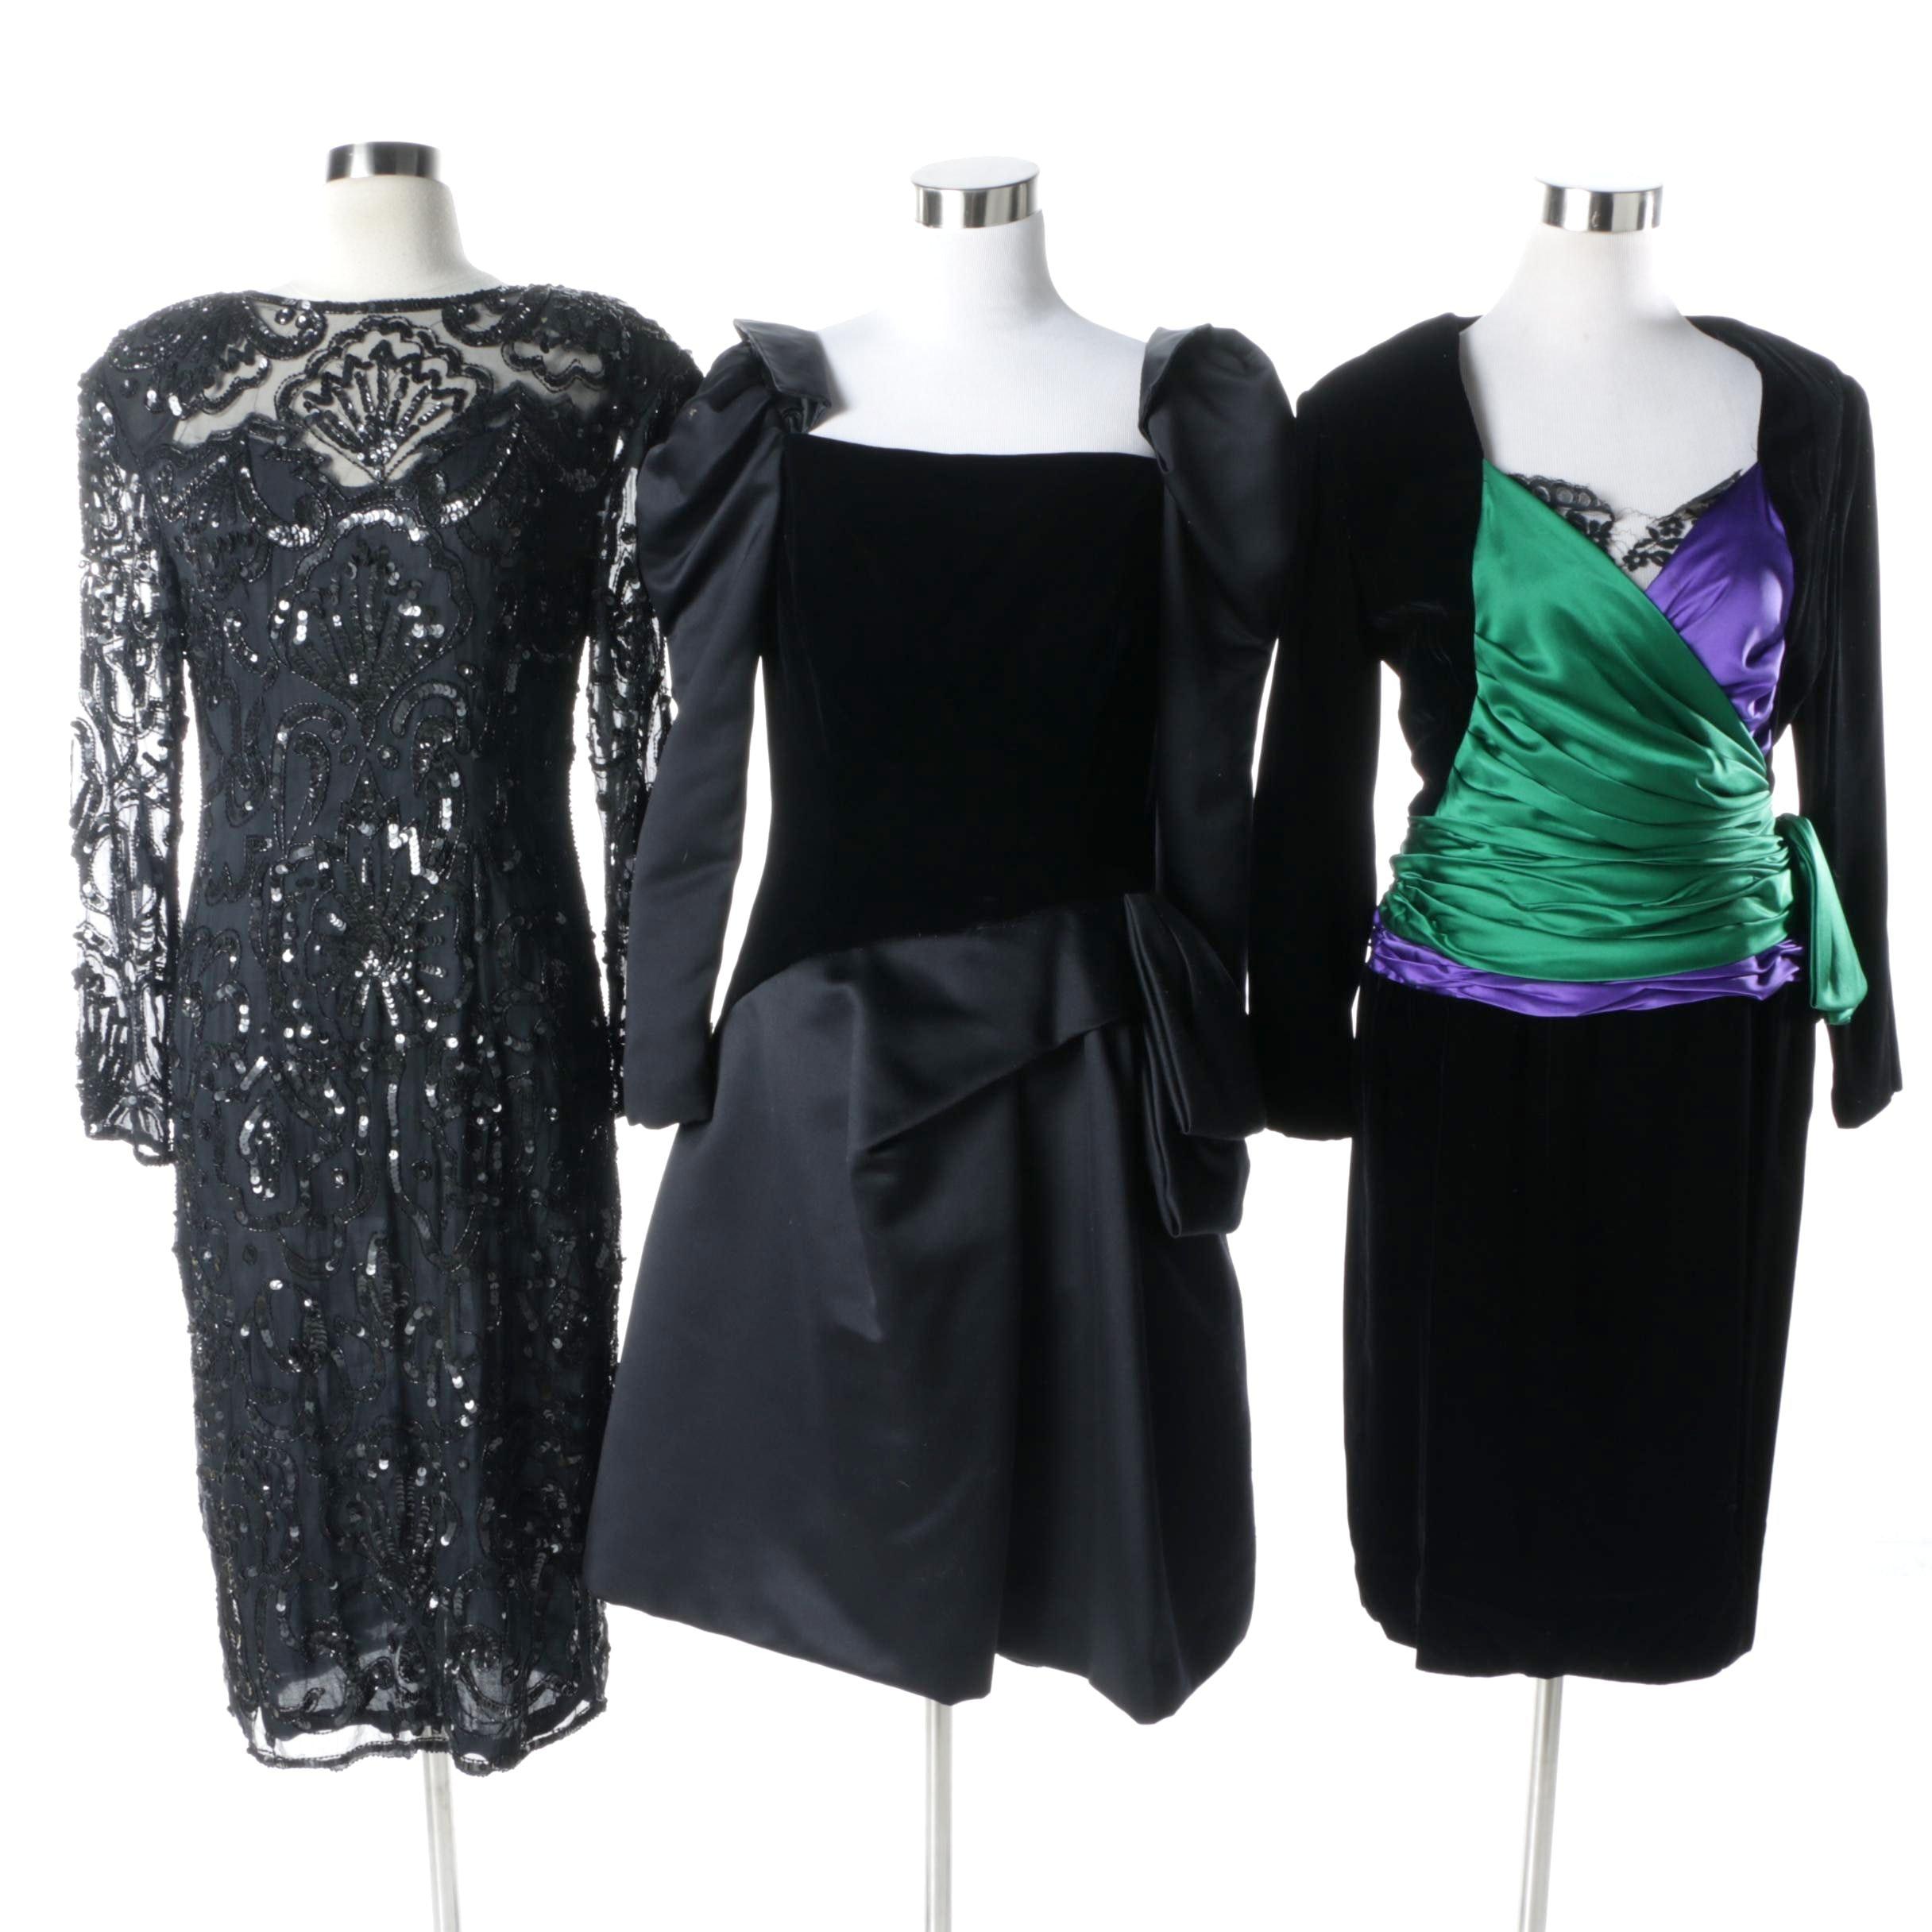 Vintage Cocktail Dresses Including Miss O by Oscar de la Renta and Victor Costa